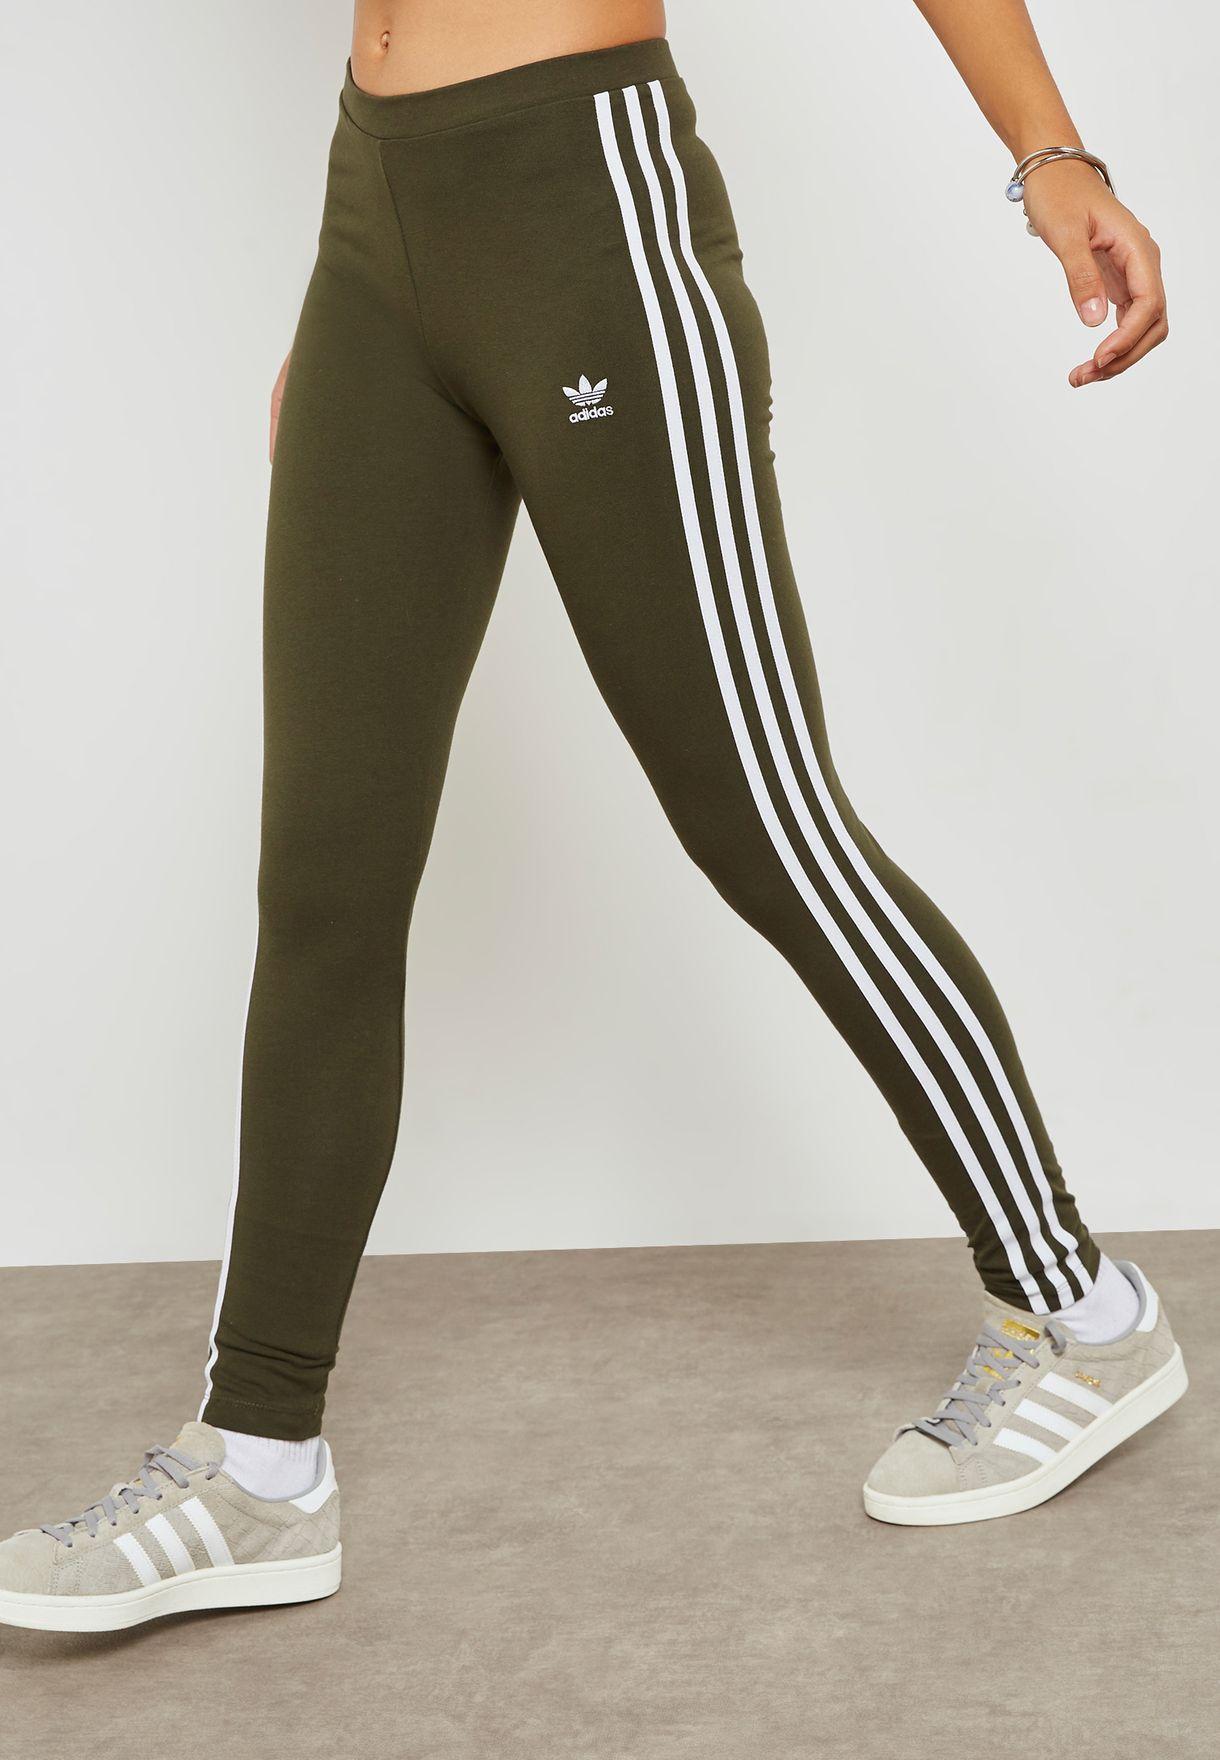 f8146aa5046 Shop adidas Originals green adicolor 3 Stripe Leggings DH3171 for ...